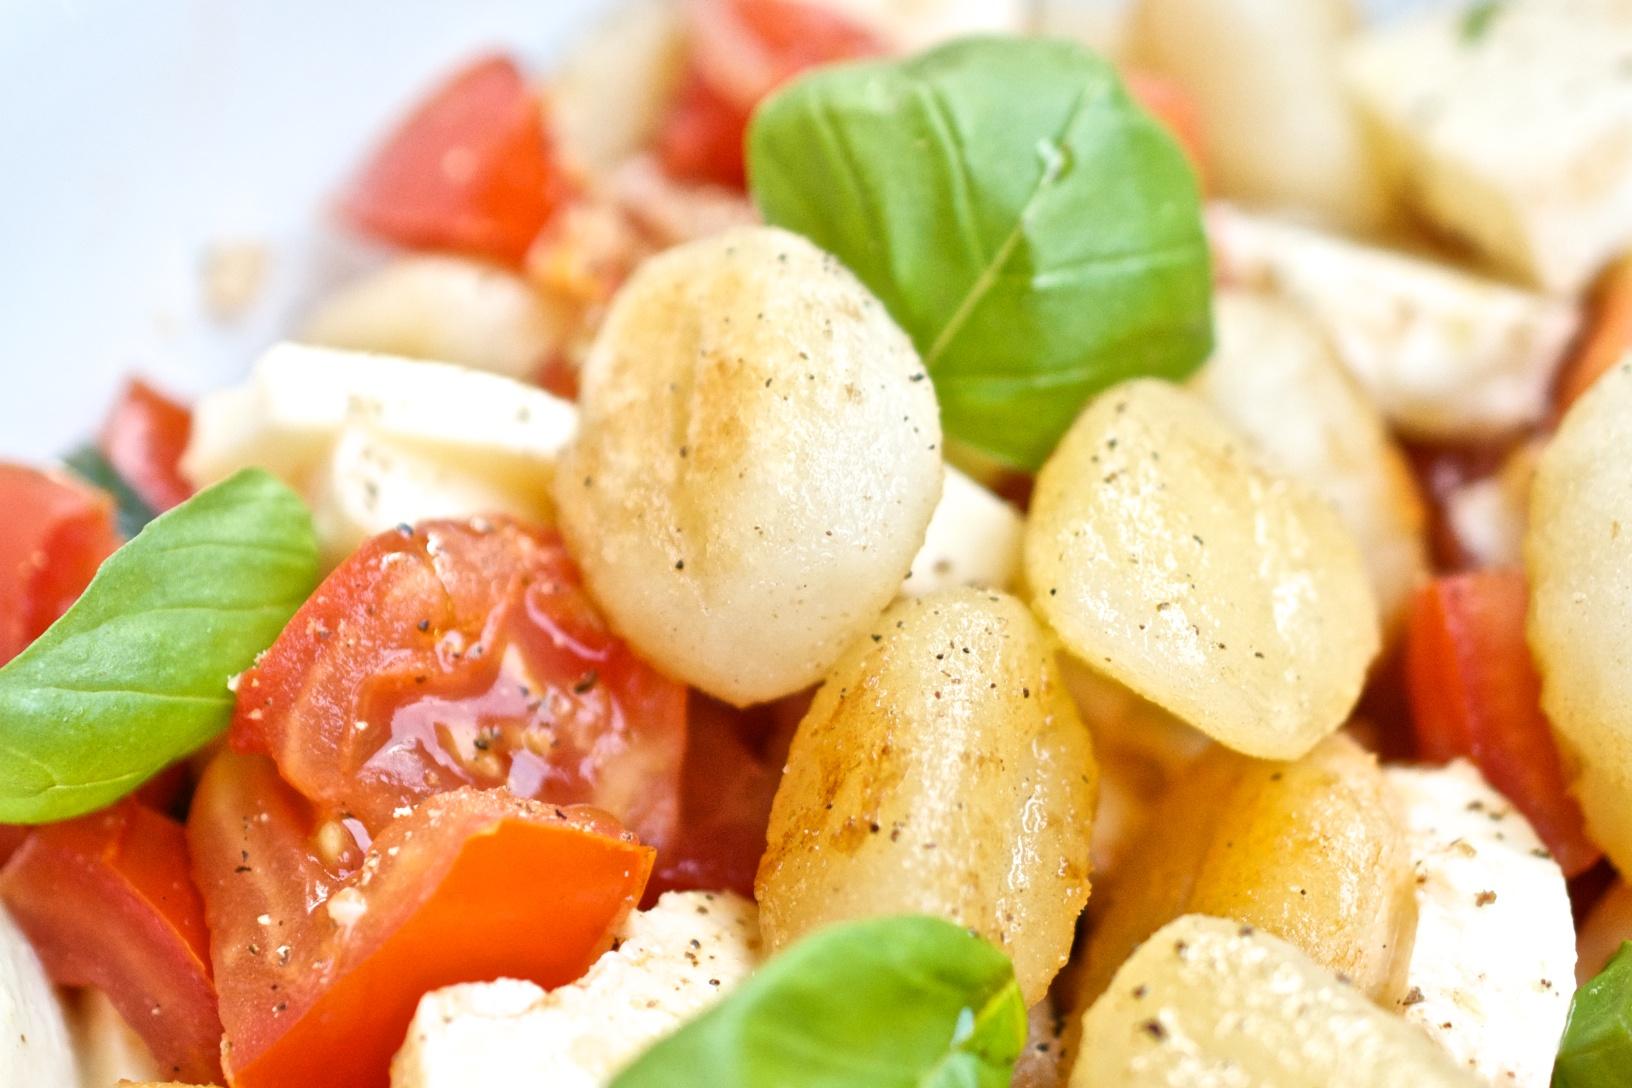 Gnocchisalat mit Mozzarella und Tomaten, Makro